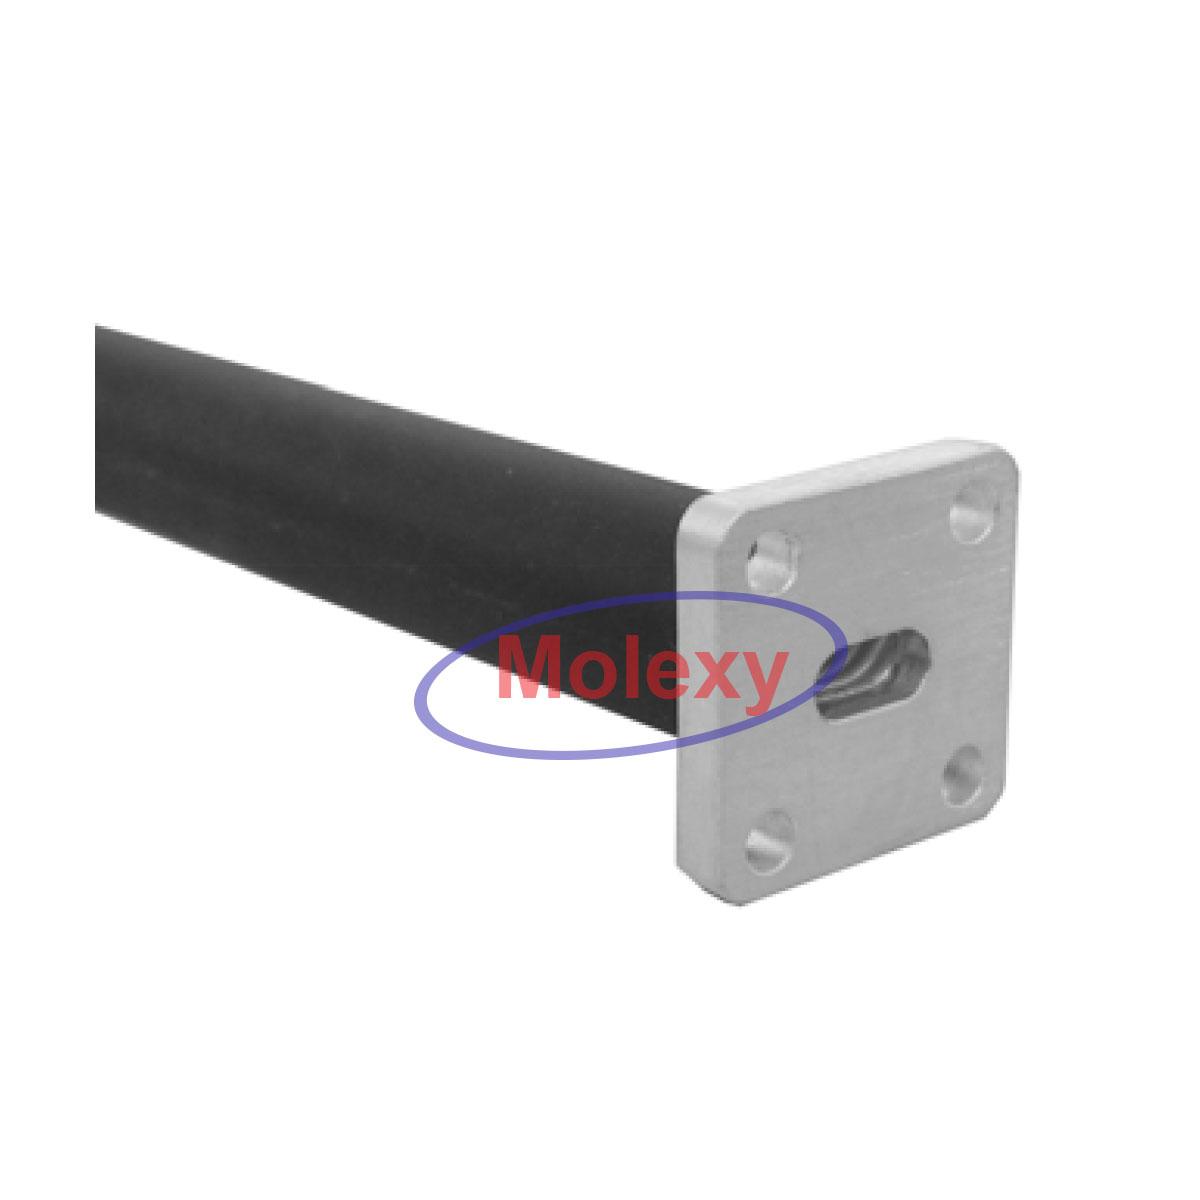 WG516050 不可扭软波导 [17.7to 26.5GHz] UBR220/PBR220